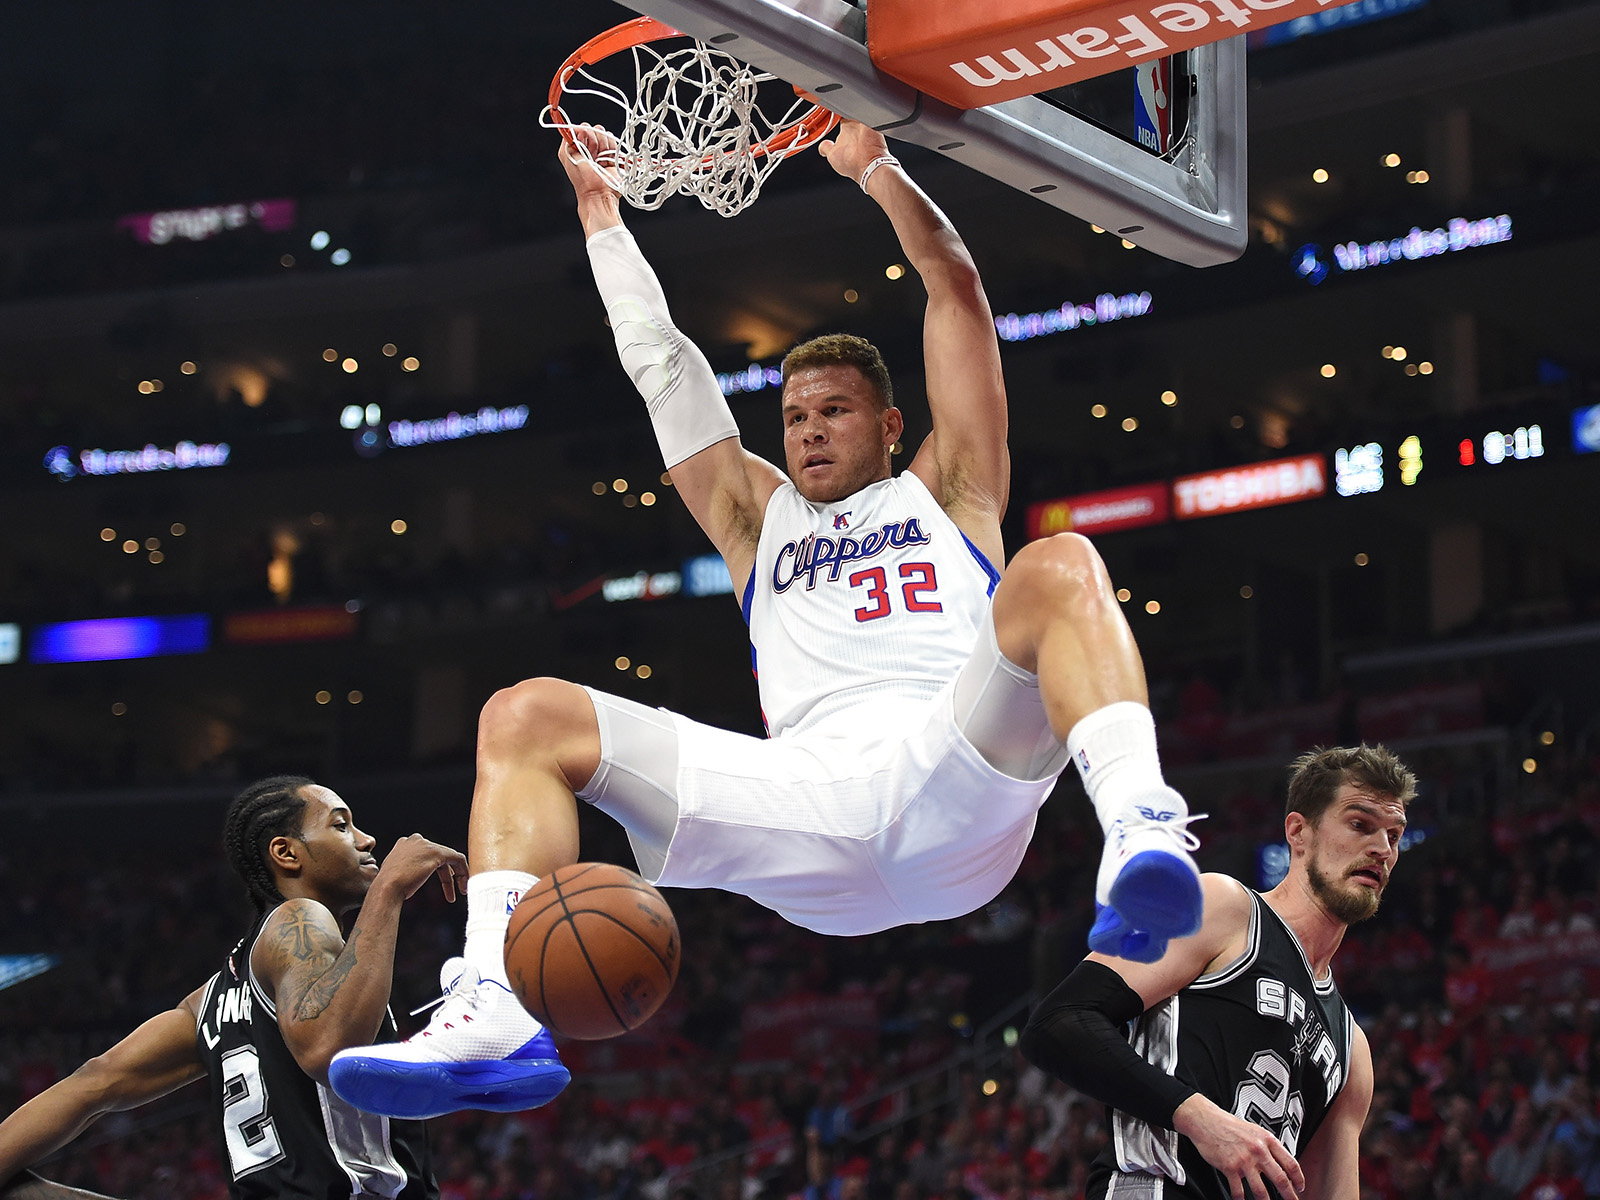 Blake Griffin hangs on the rim as Kawhi Leonard and the San Antonio Spurs look on.